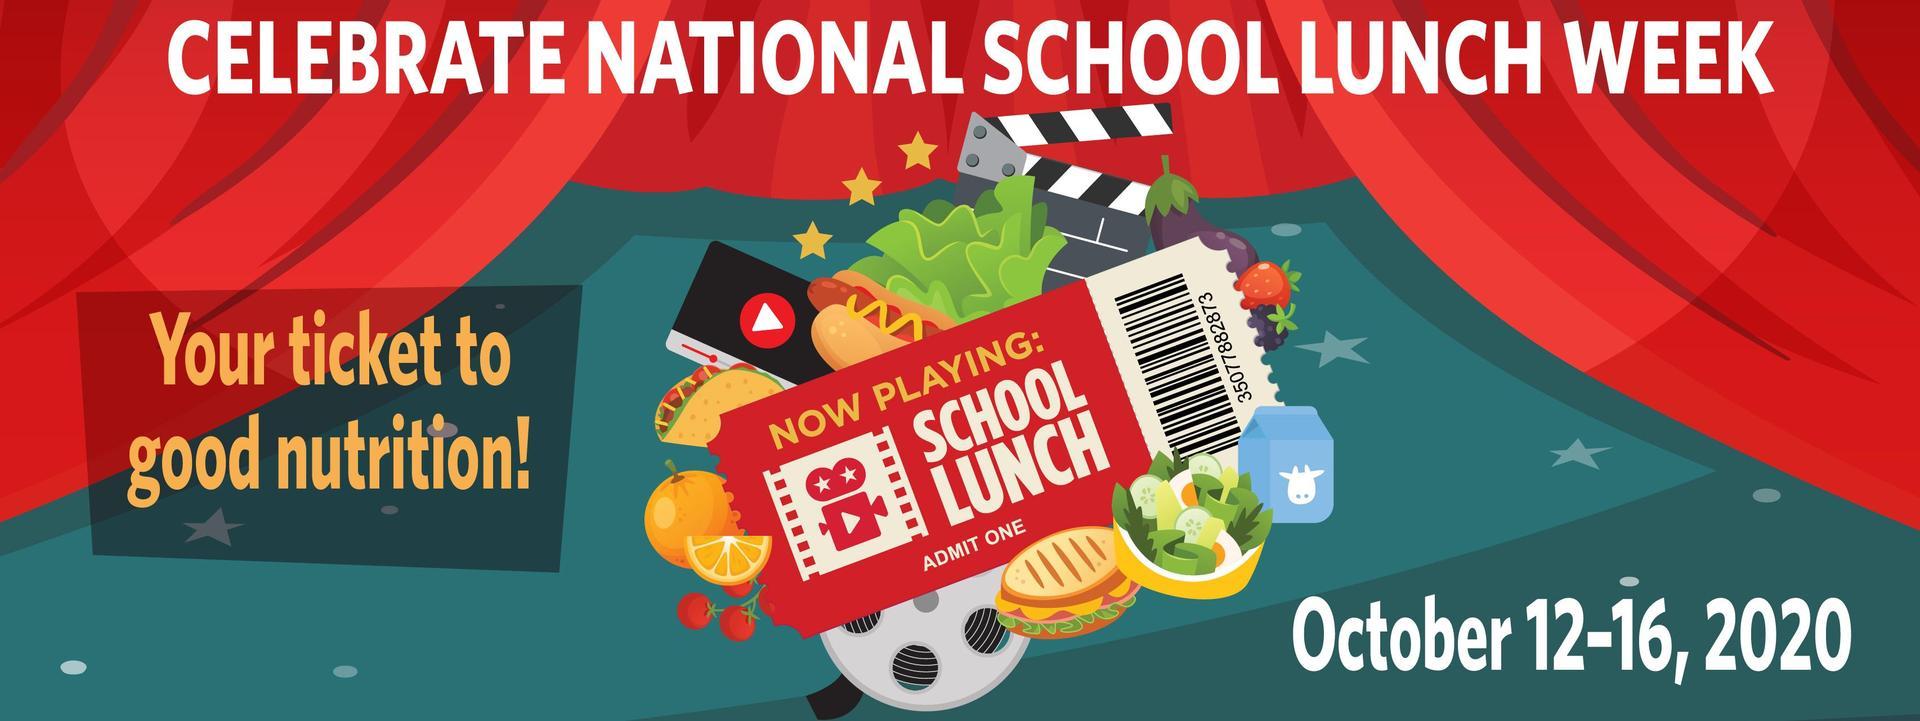 National School Lunch Week photo